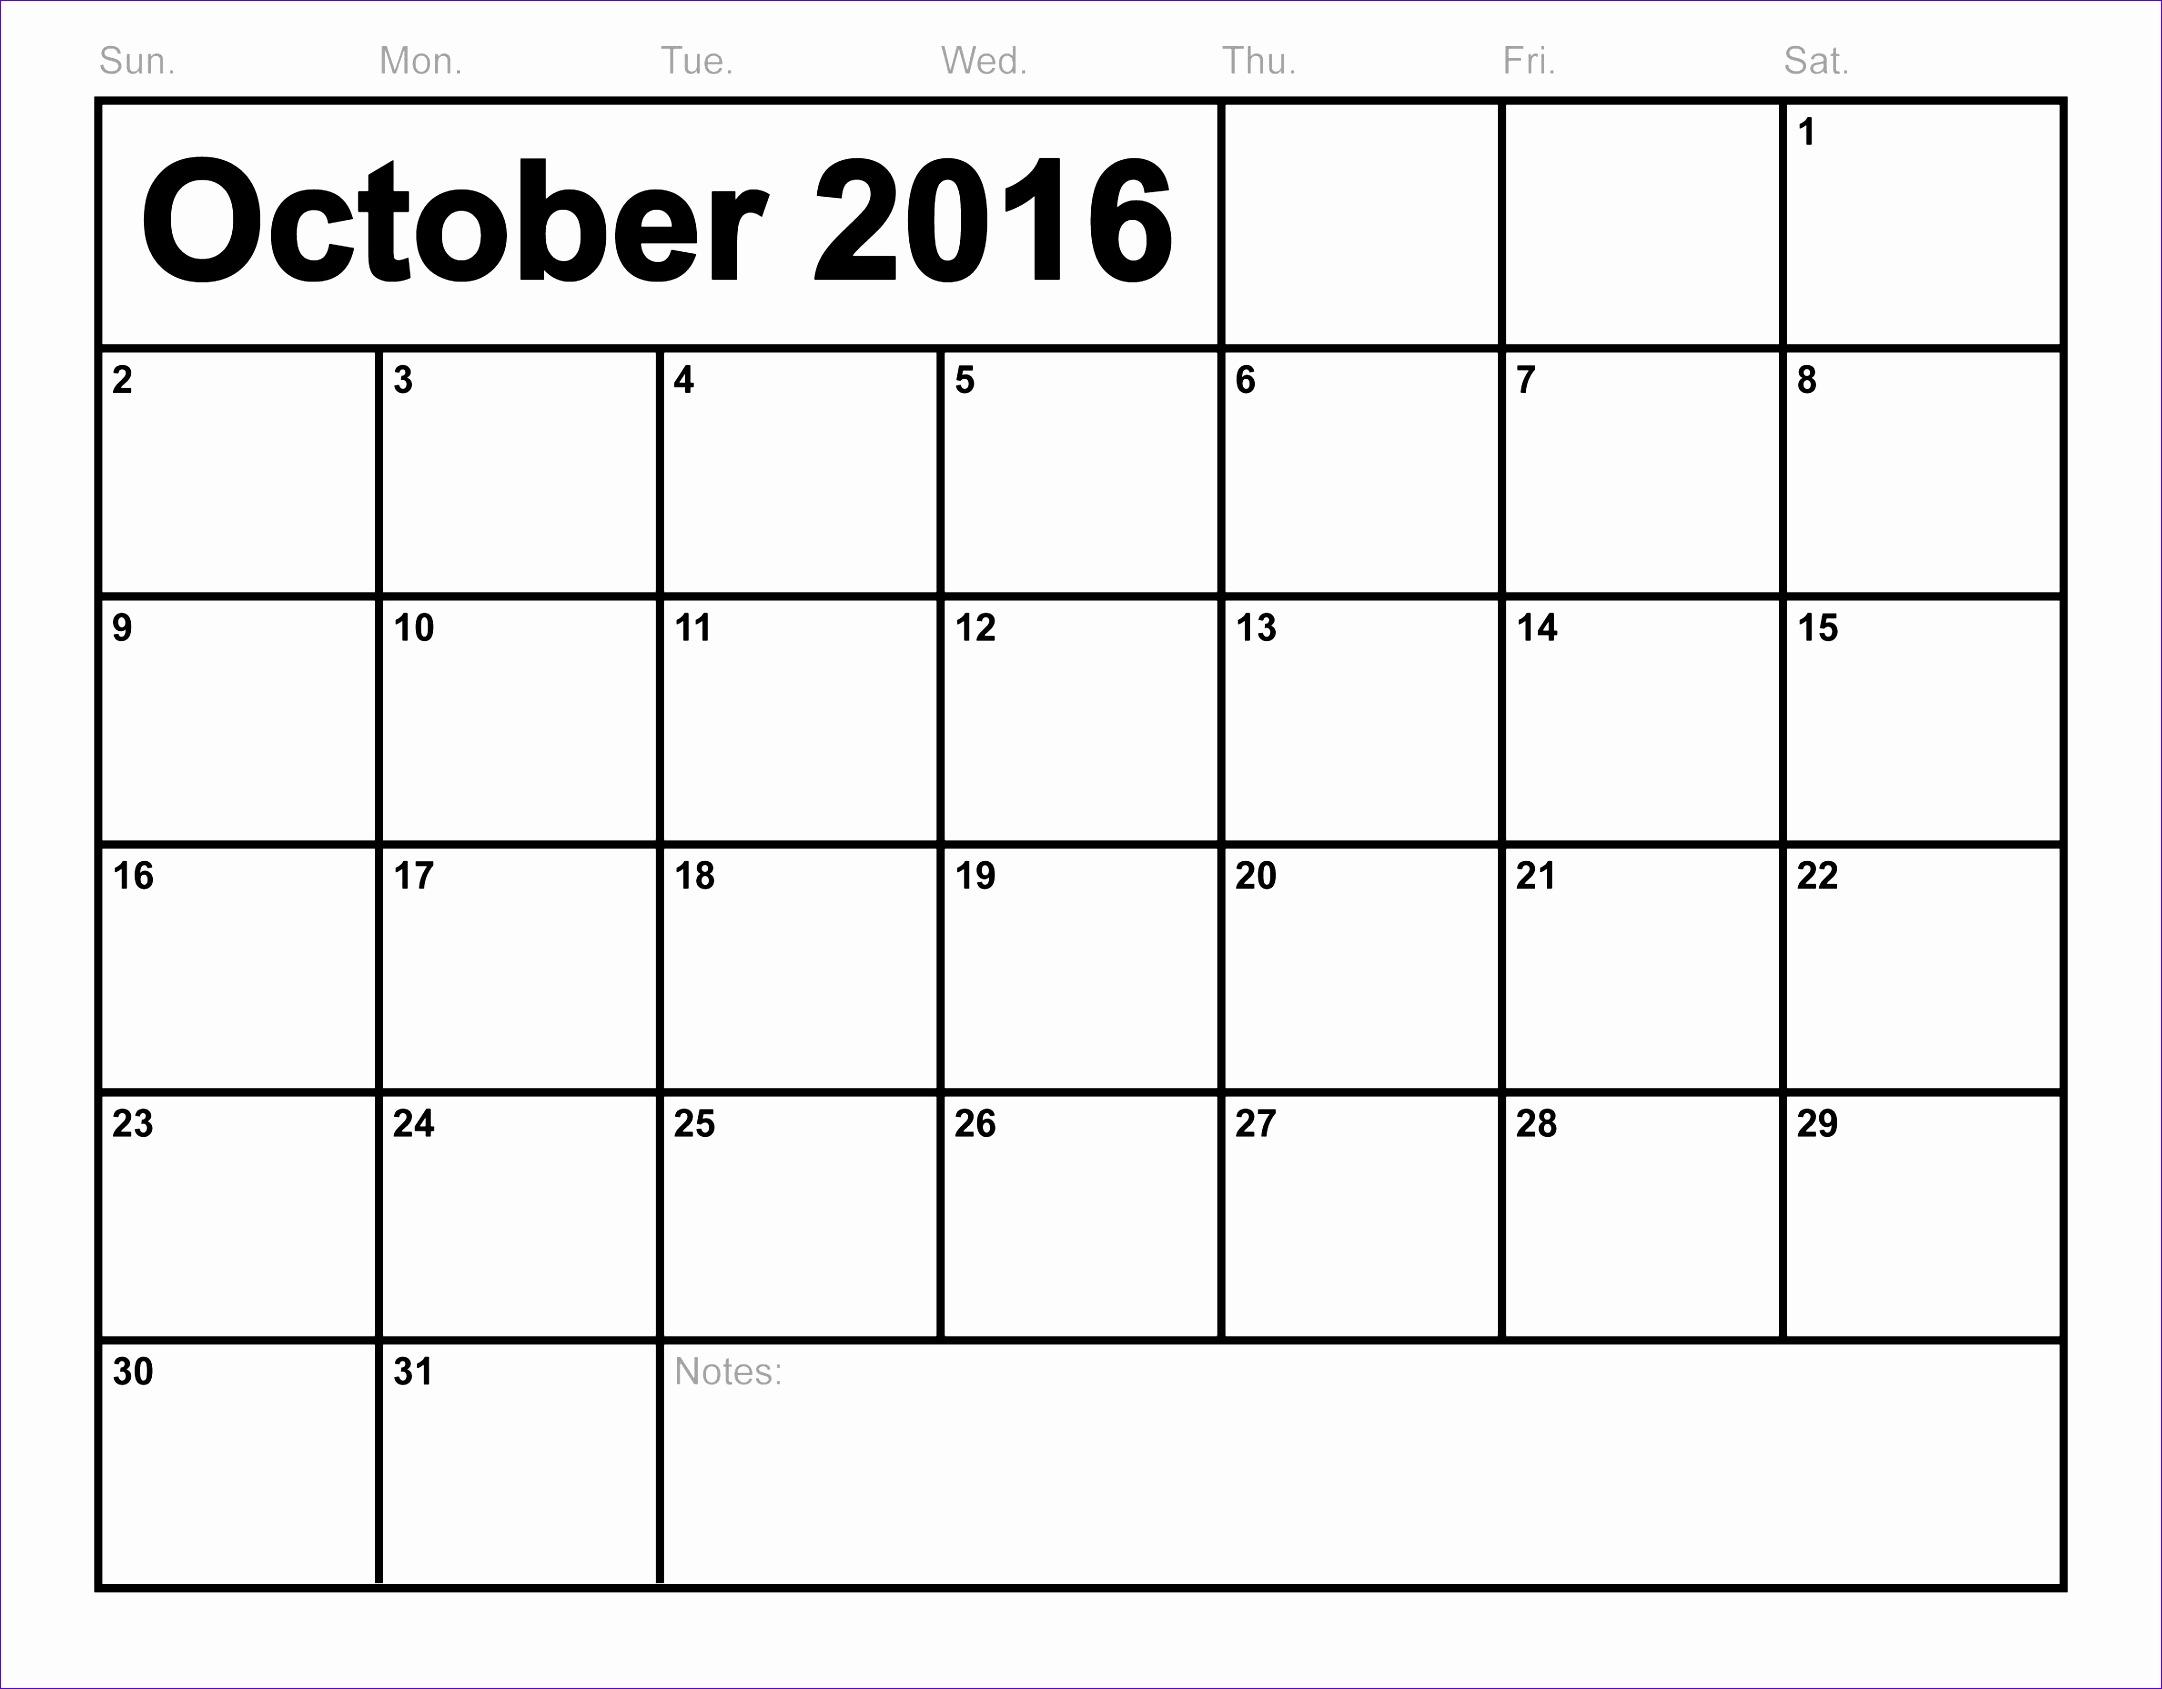 excel work schedule template monthly 21621689